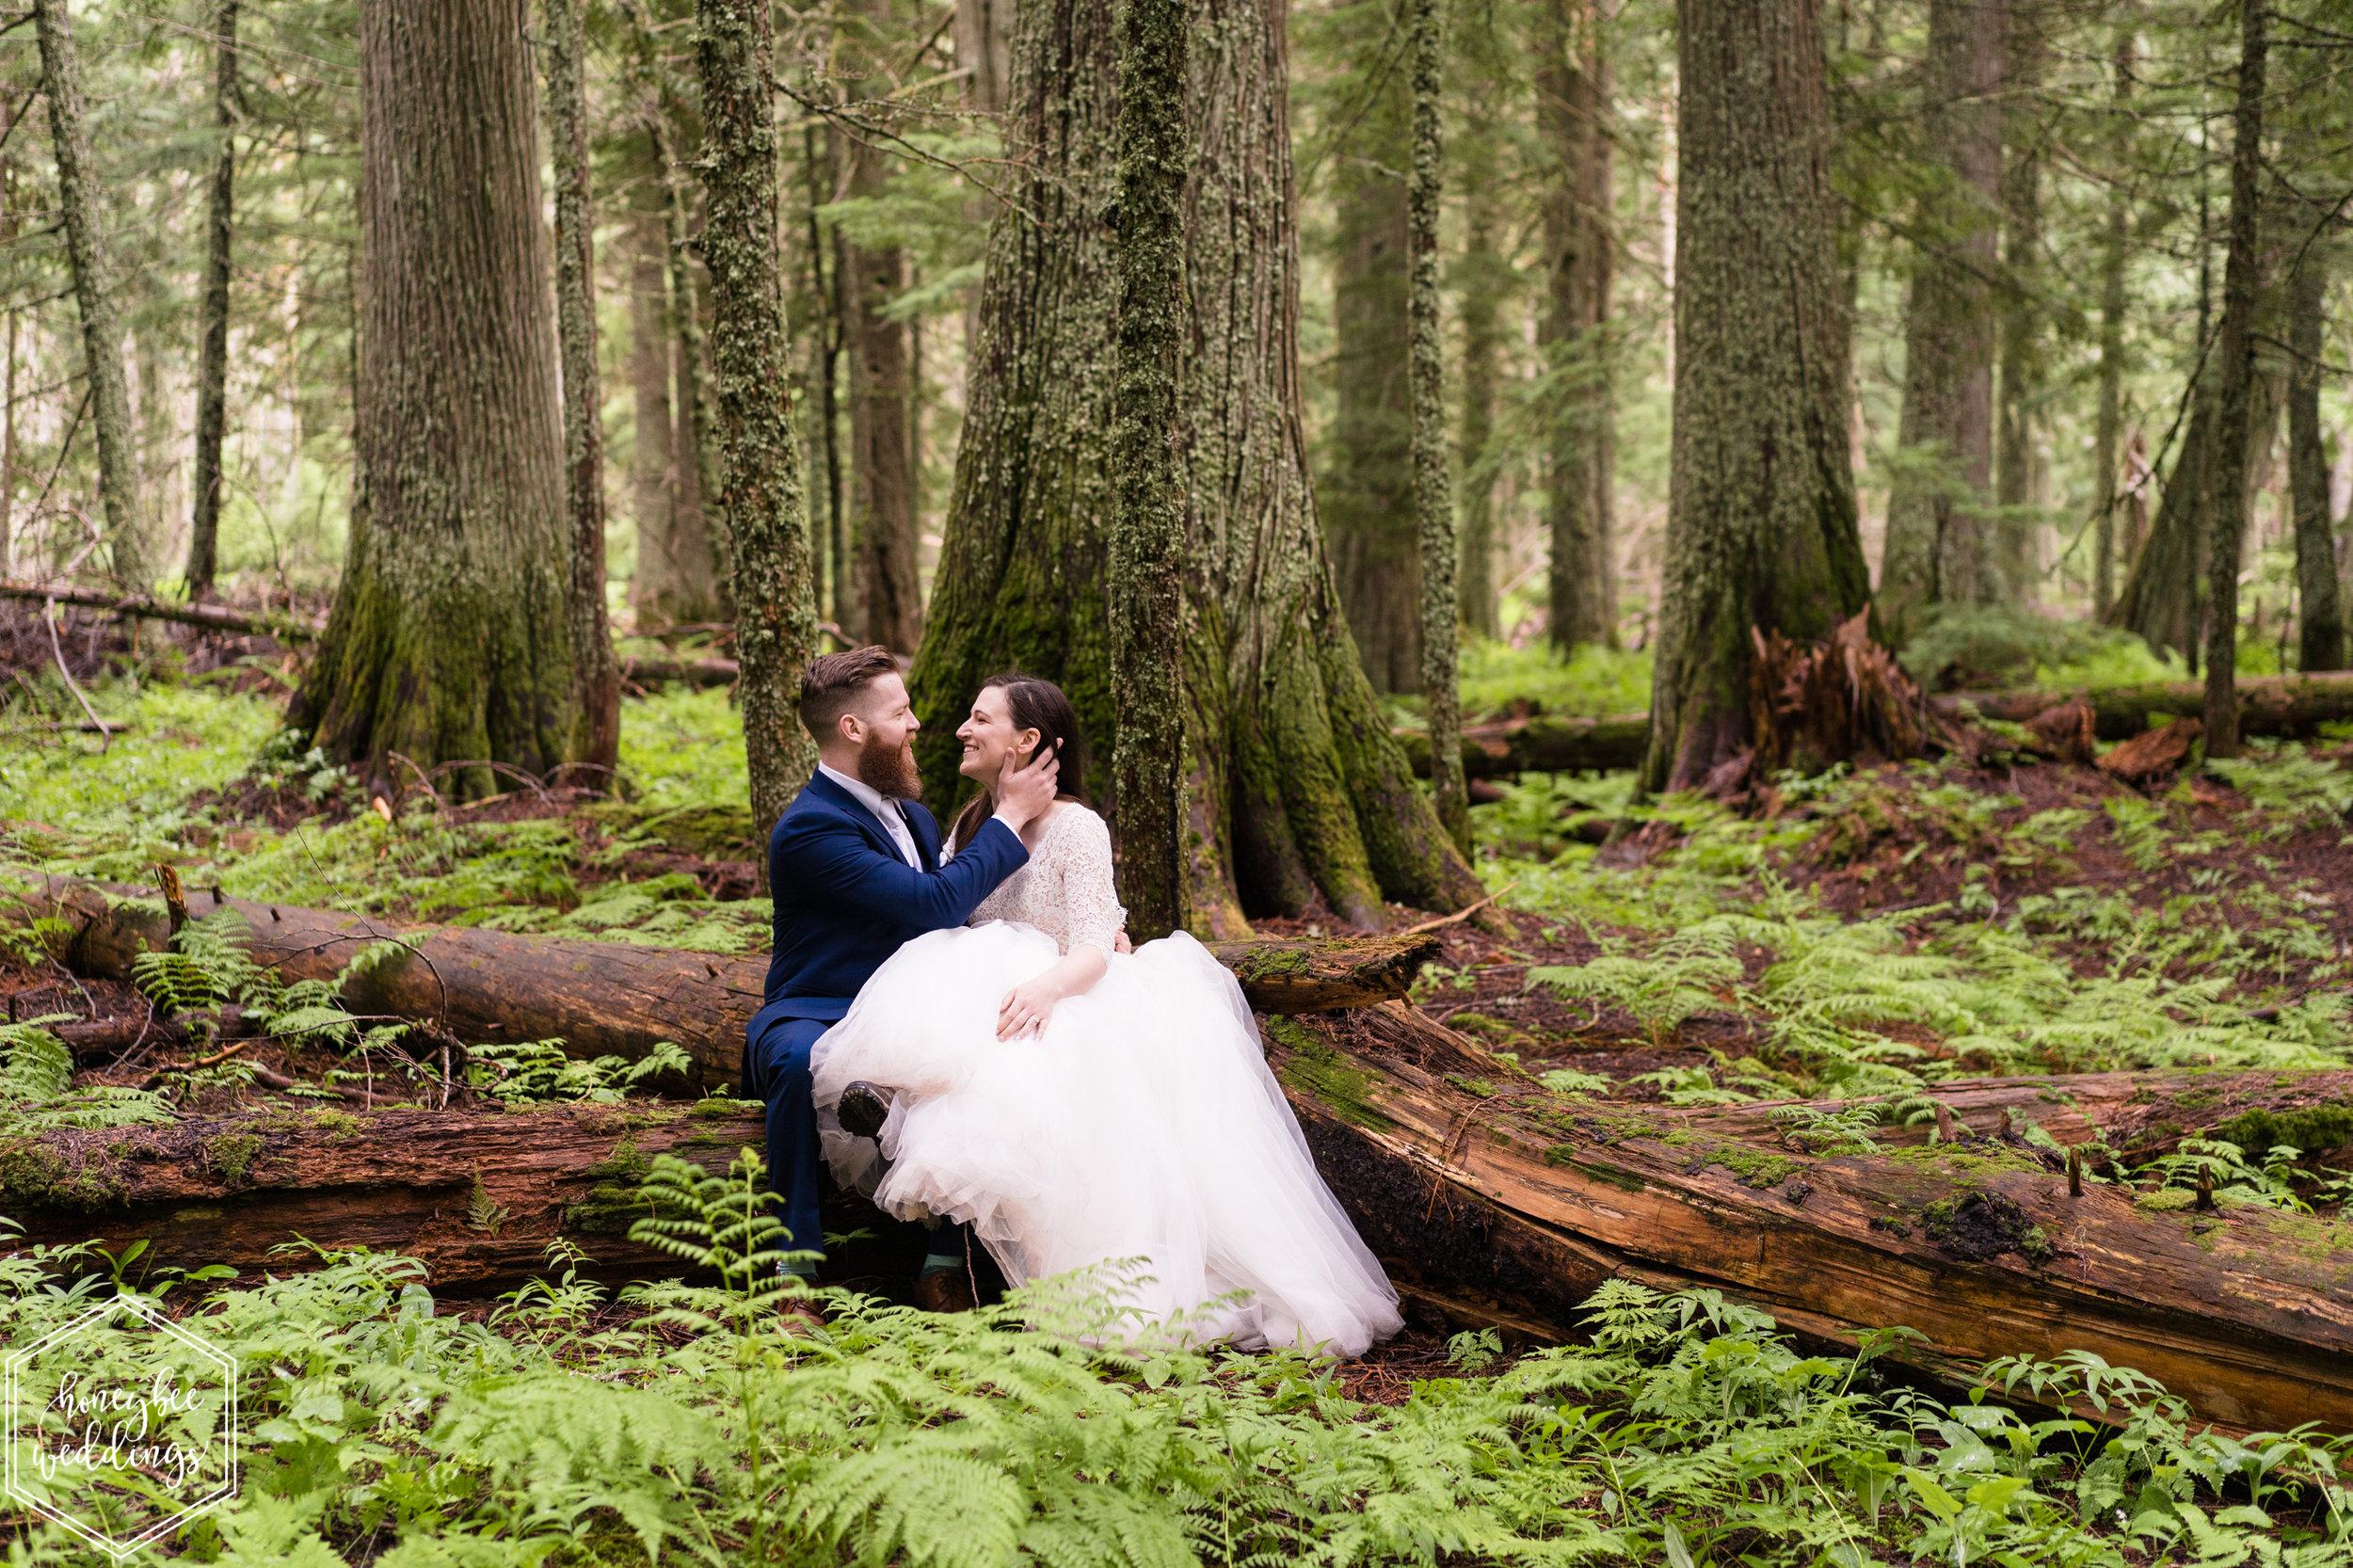 335Glacier National Park Wedding_Izaak Walton Inn Wedding_Honeybee Weddings_Norah & Kyle_June 09, 2019-248.jpg